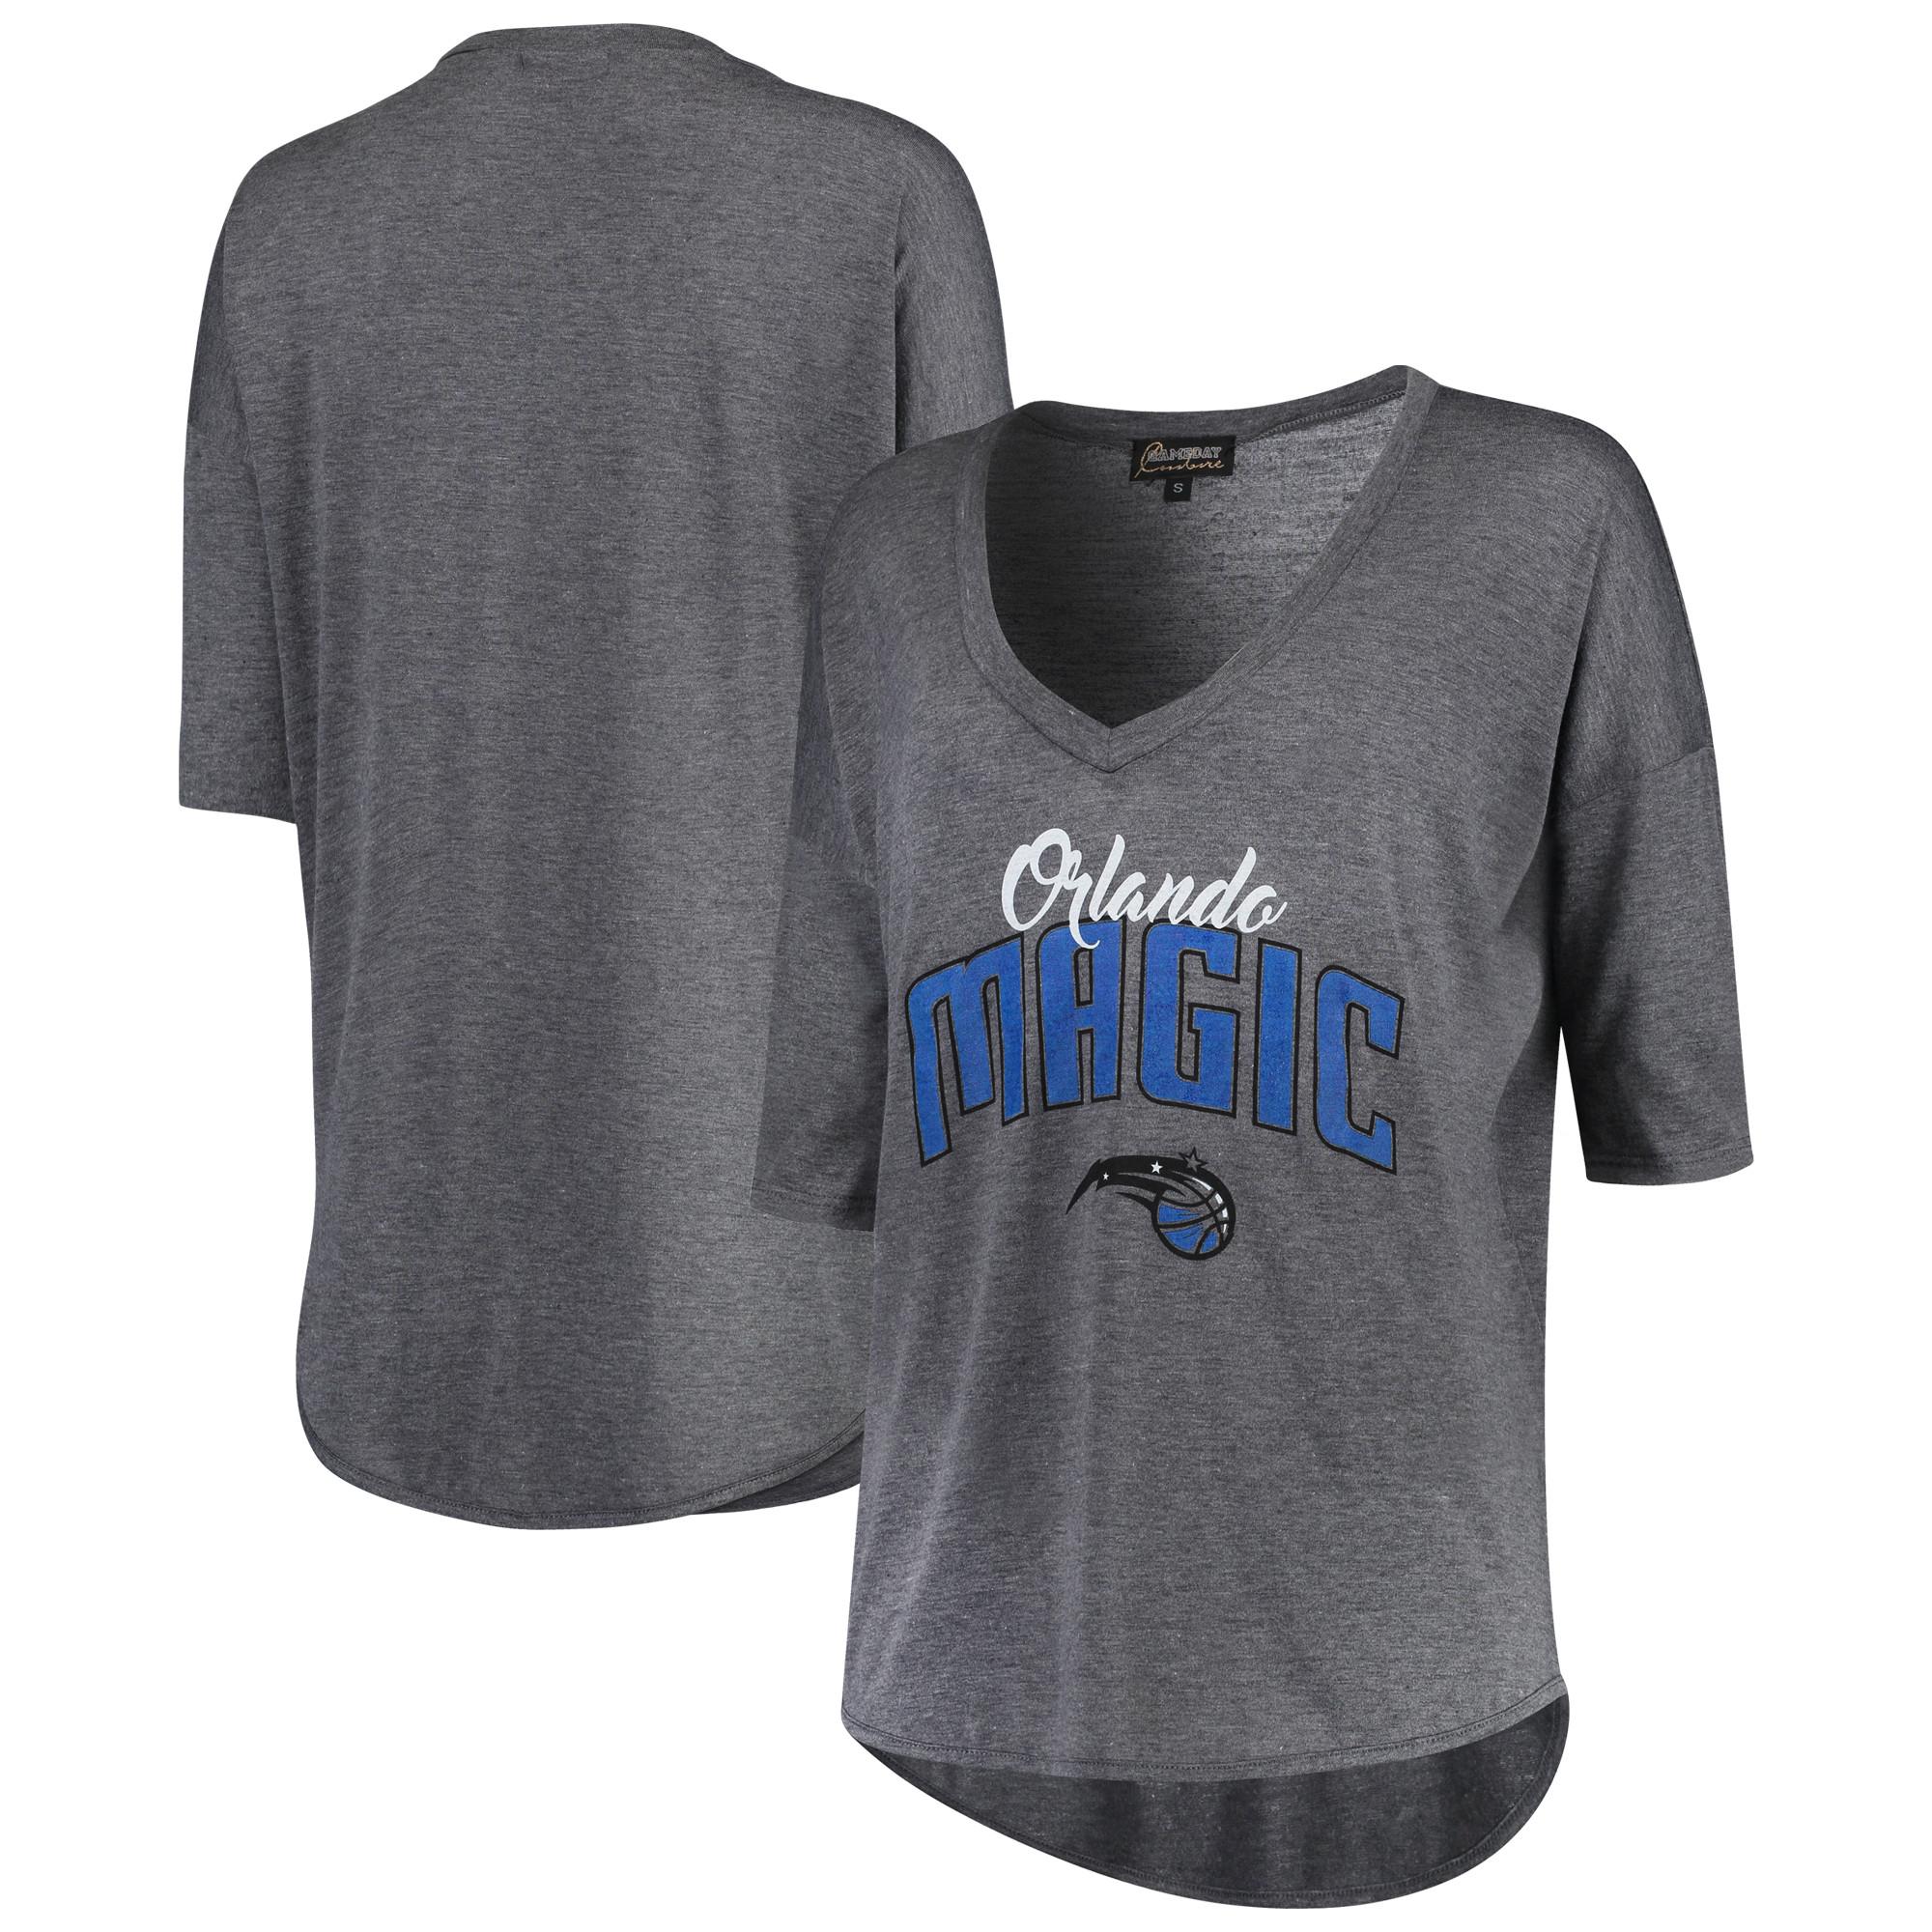 Orlando Magic Women's Deep V-Neck Tri-Blend Half-Sleeve T-Shirt - Gray